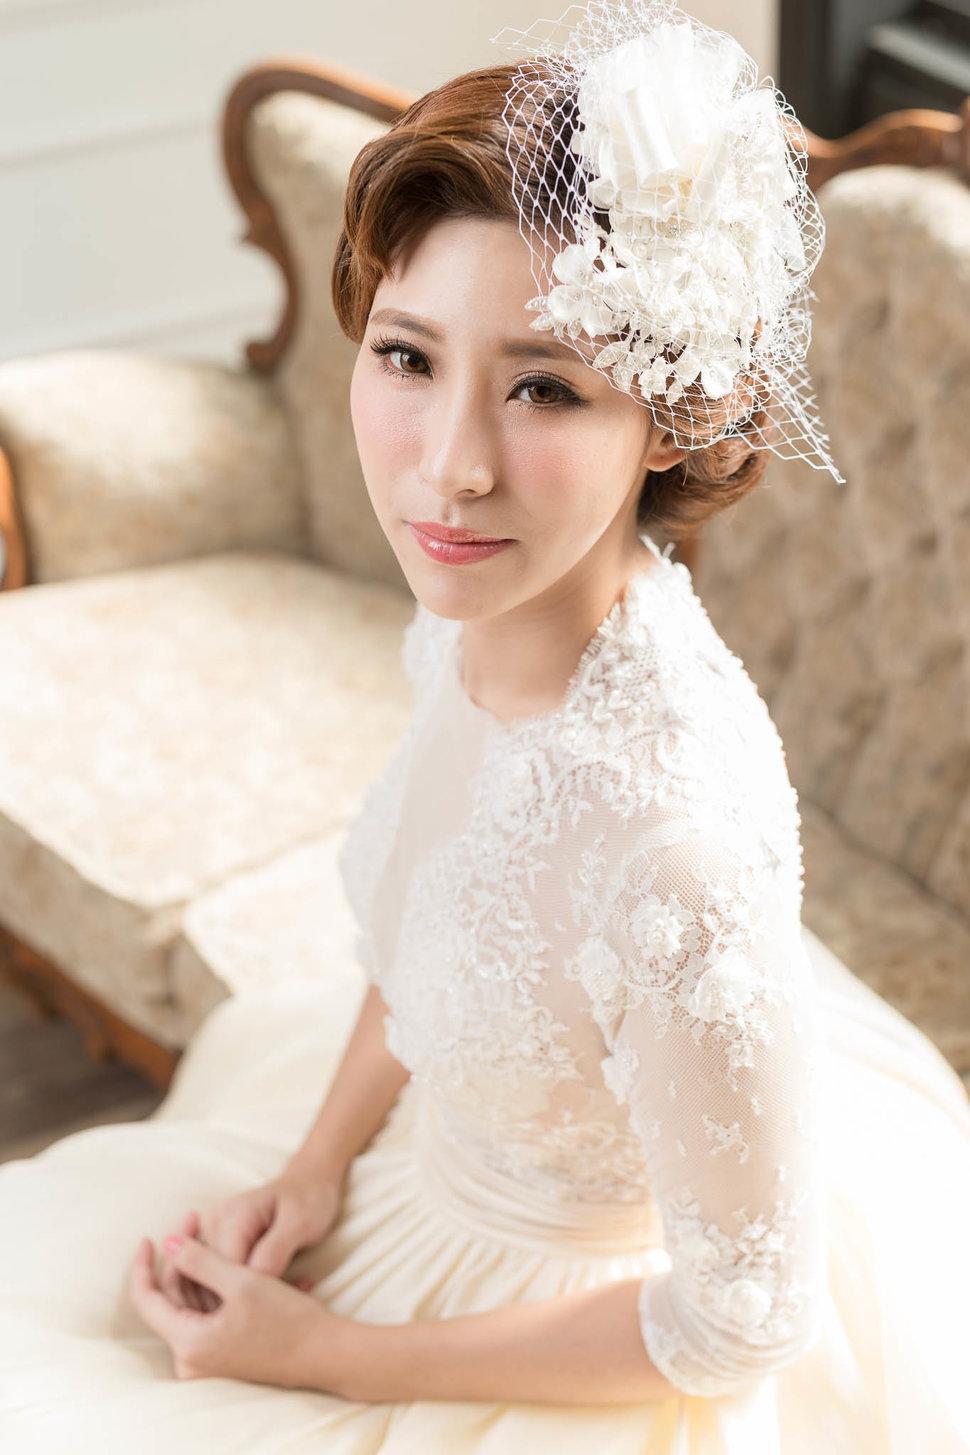 18PHOTO自主婚紗-潤兒(編號:406247) - 18PHOTO 婚紗影像攝影工作室 - 結婚吧